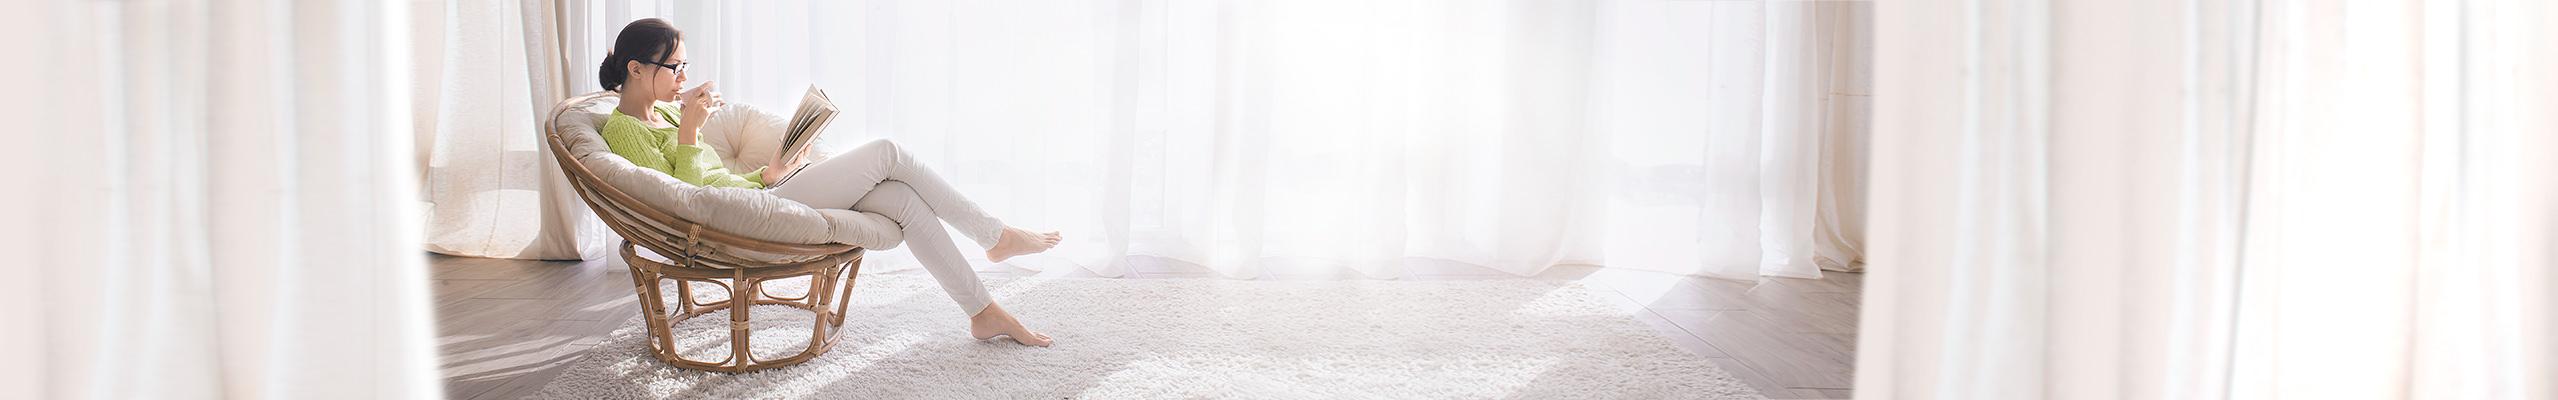 mini bhkw. Black Bedroom Furniture Sets. Home Design Ideas